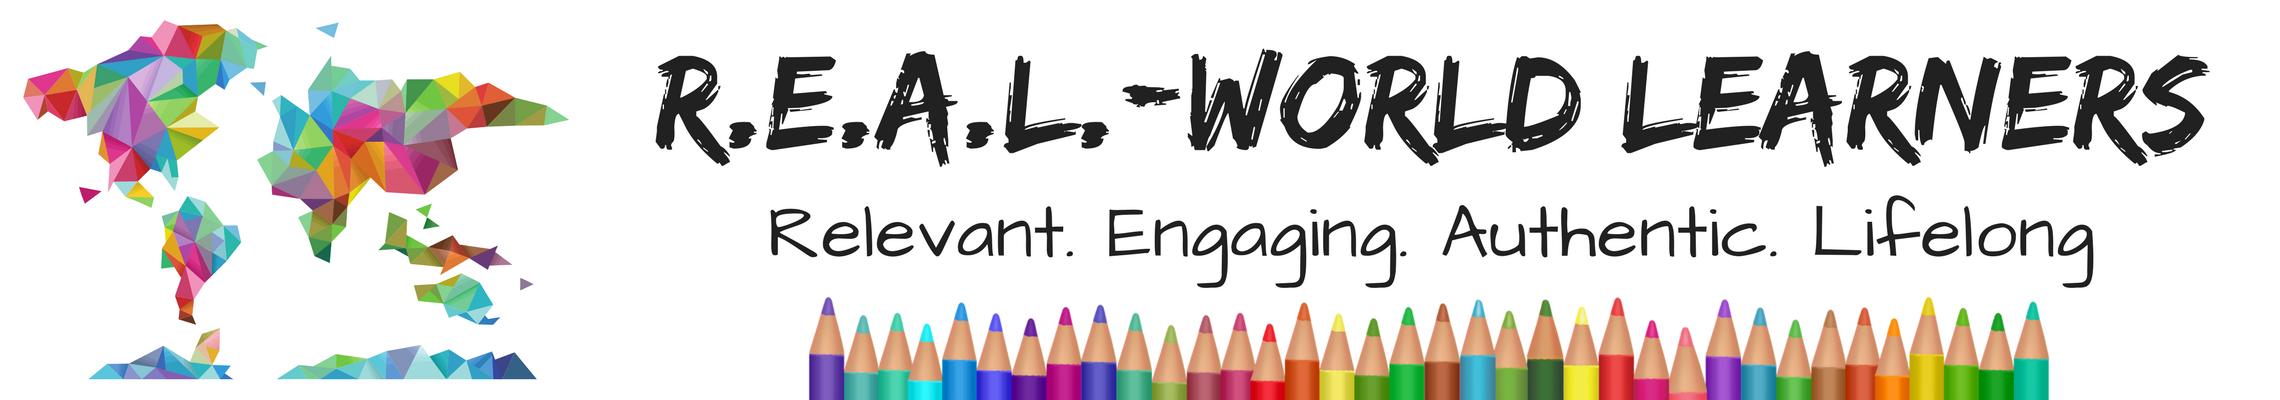 R.E.A.L.-World Learners (1)